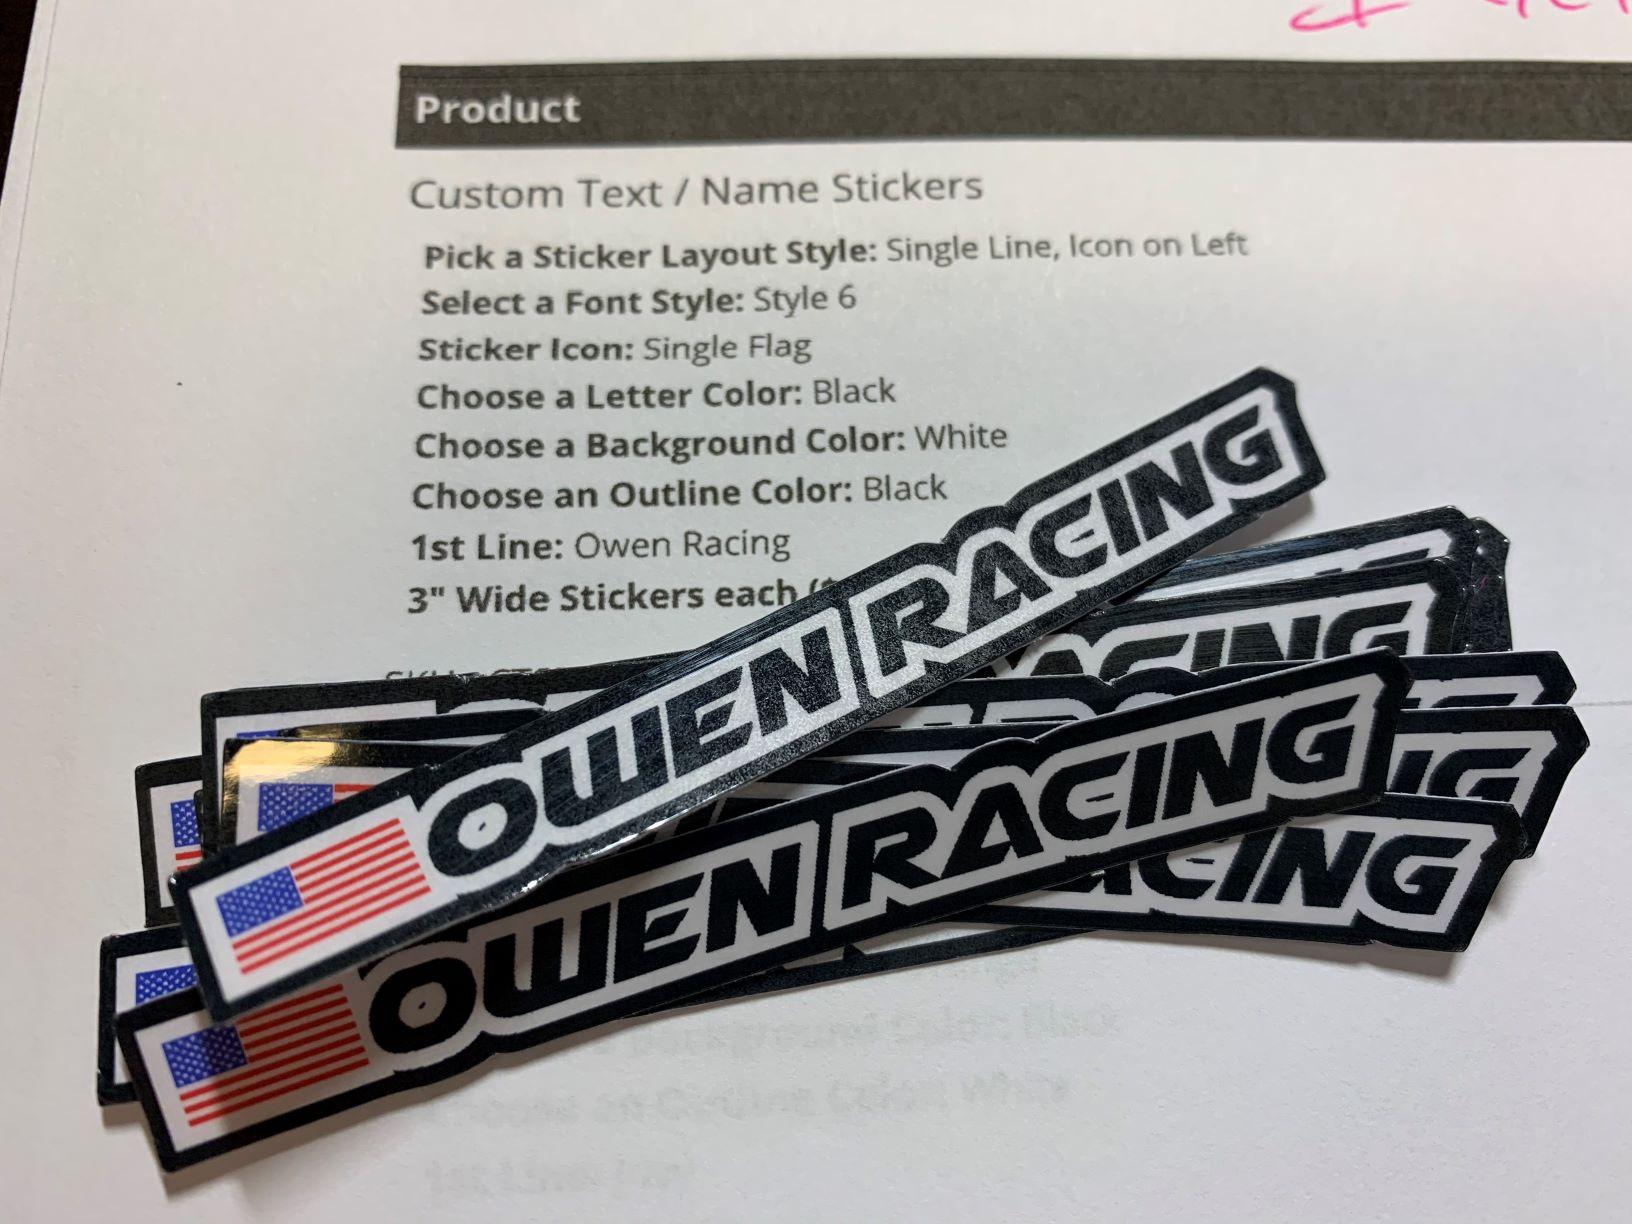 Text Stickers, Custom Text Stickers